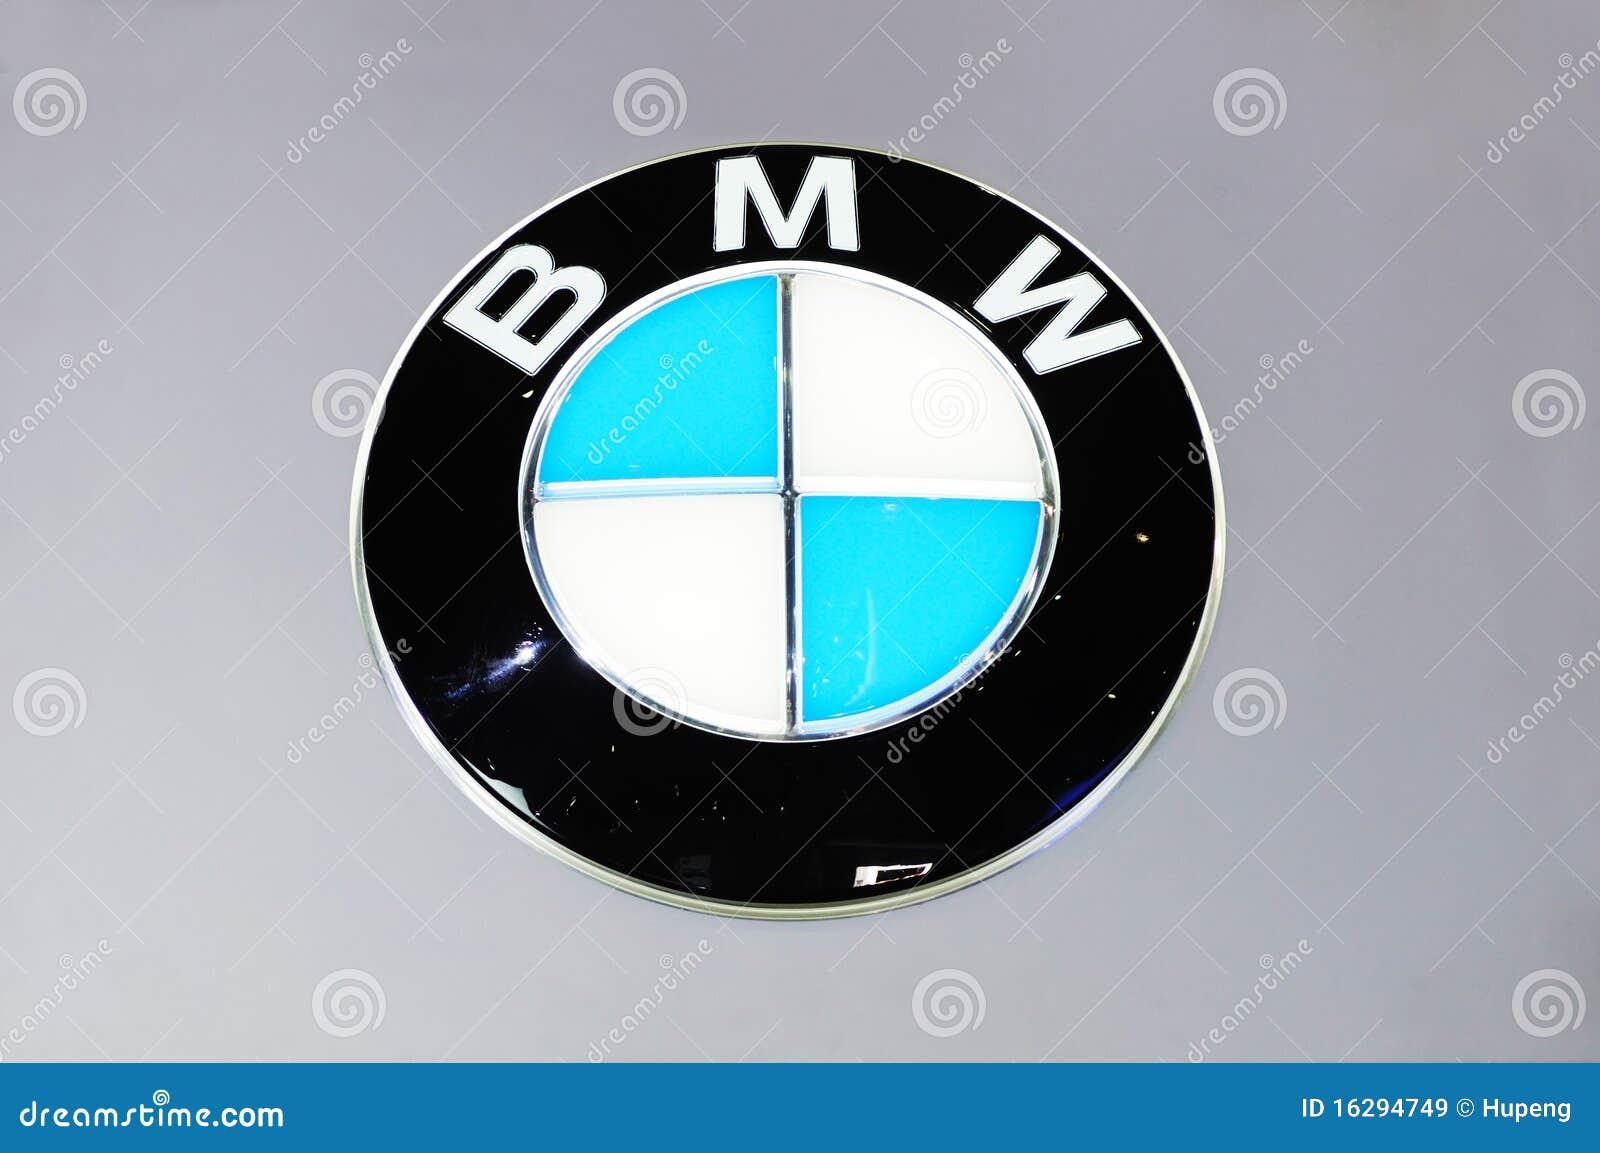 Bmw Logo Editorial Stock Image Image Of Exhibition